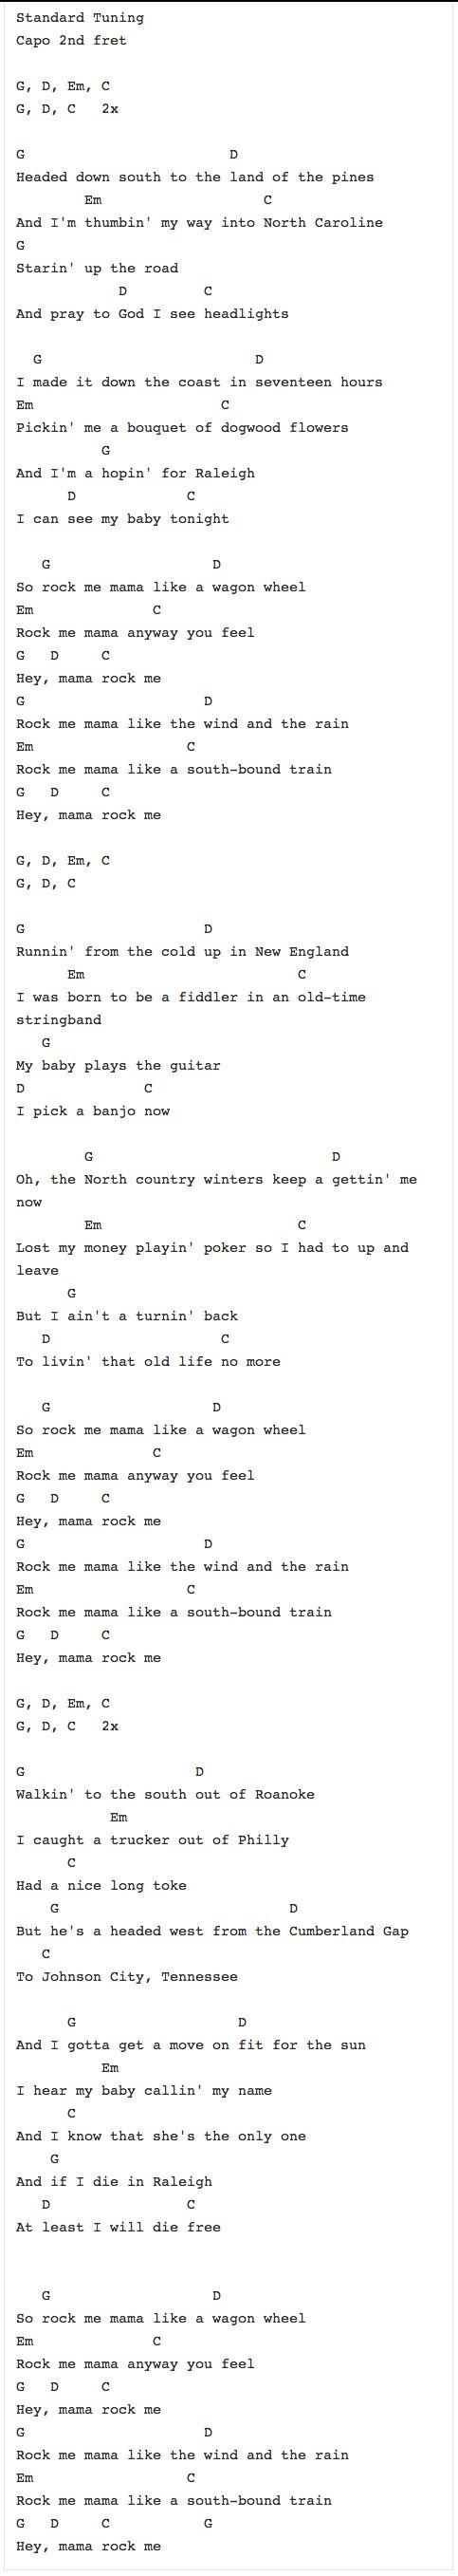 guitar-chords-wagon-wheel